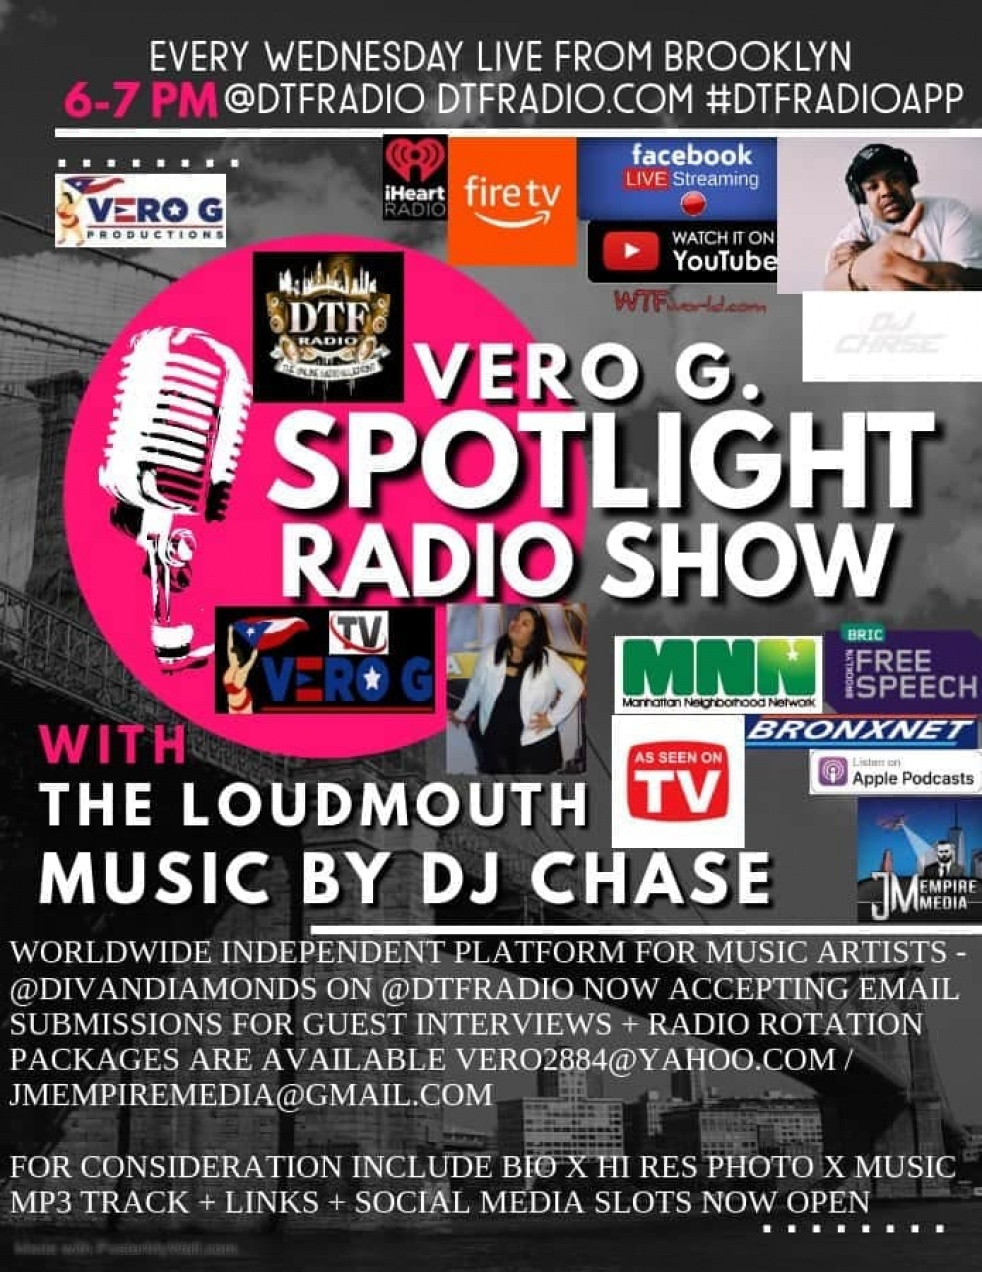 Vero G. Spotlight Radio Show - Cover Image